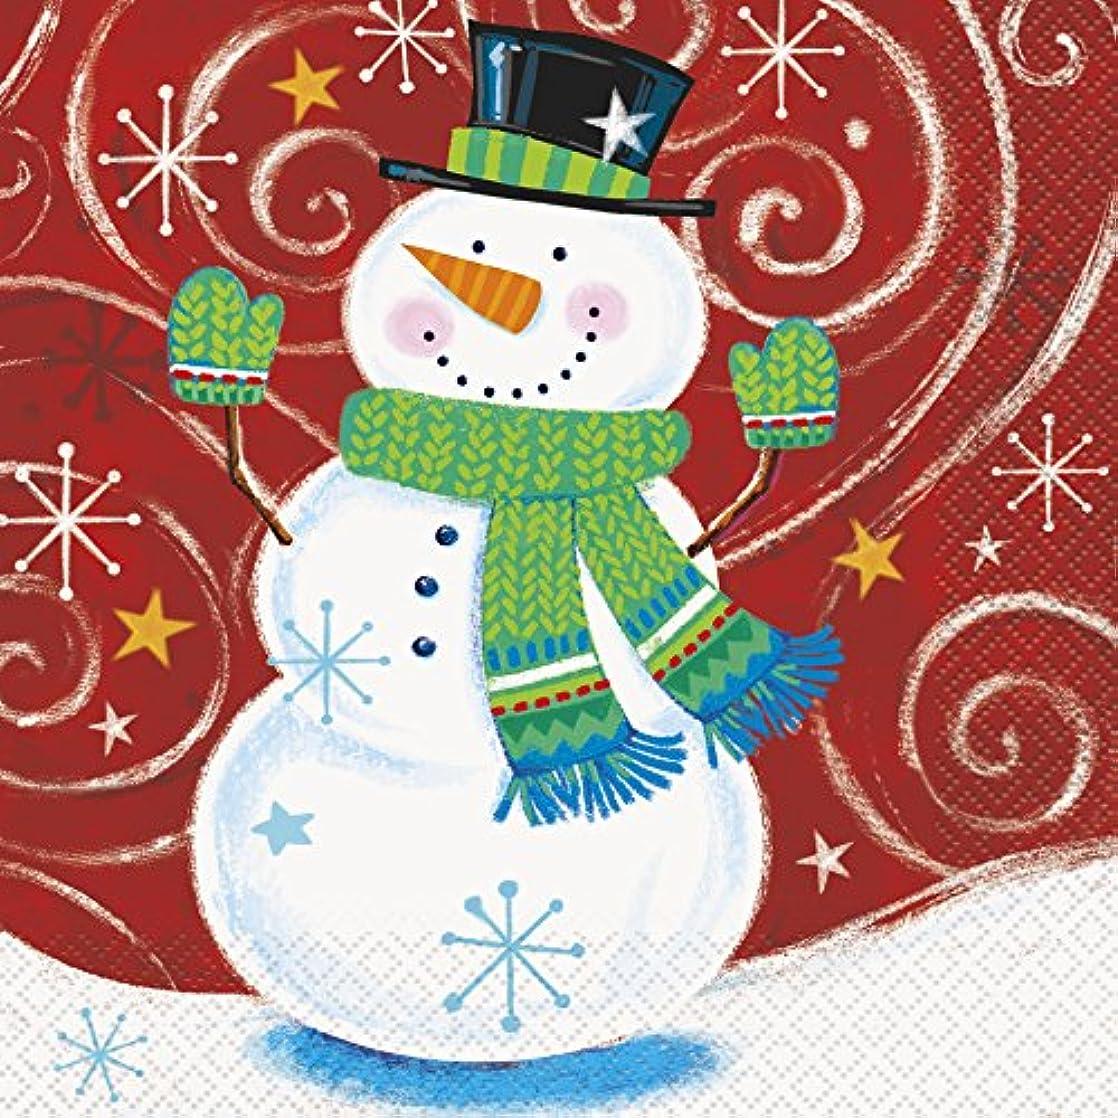 Snowman Swirl Holiday Party Napkins, 16ct ebdbovmv14241